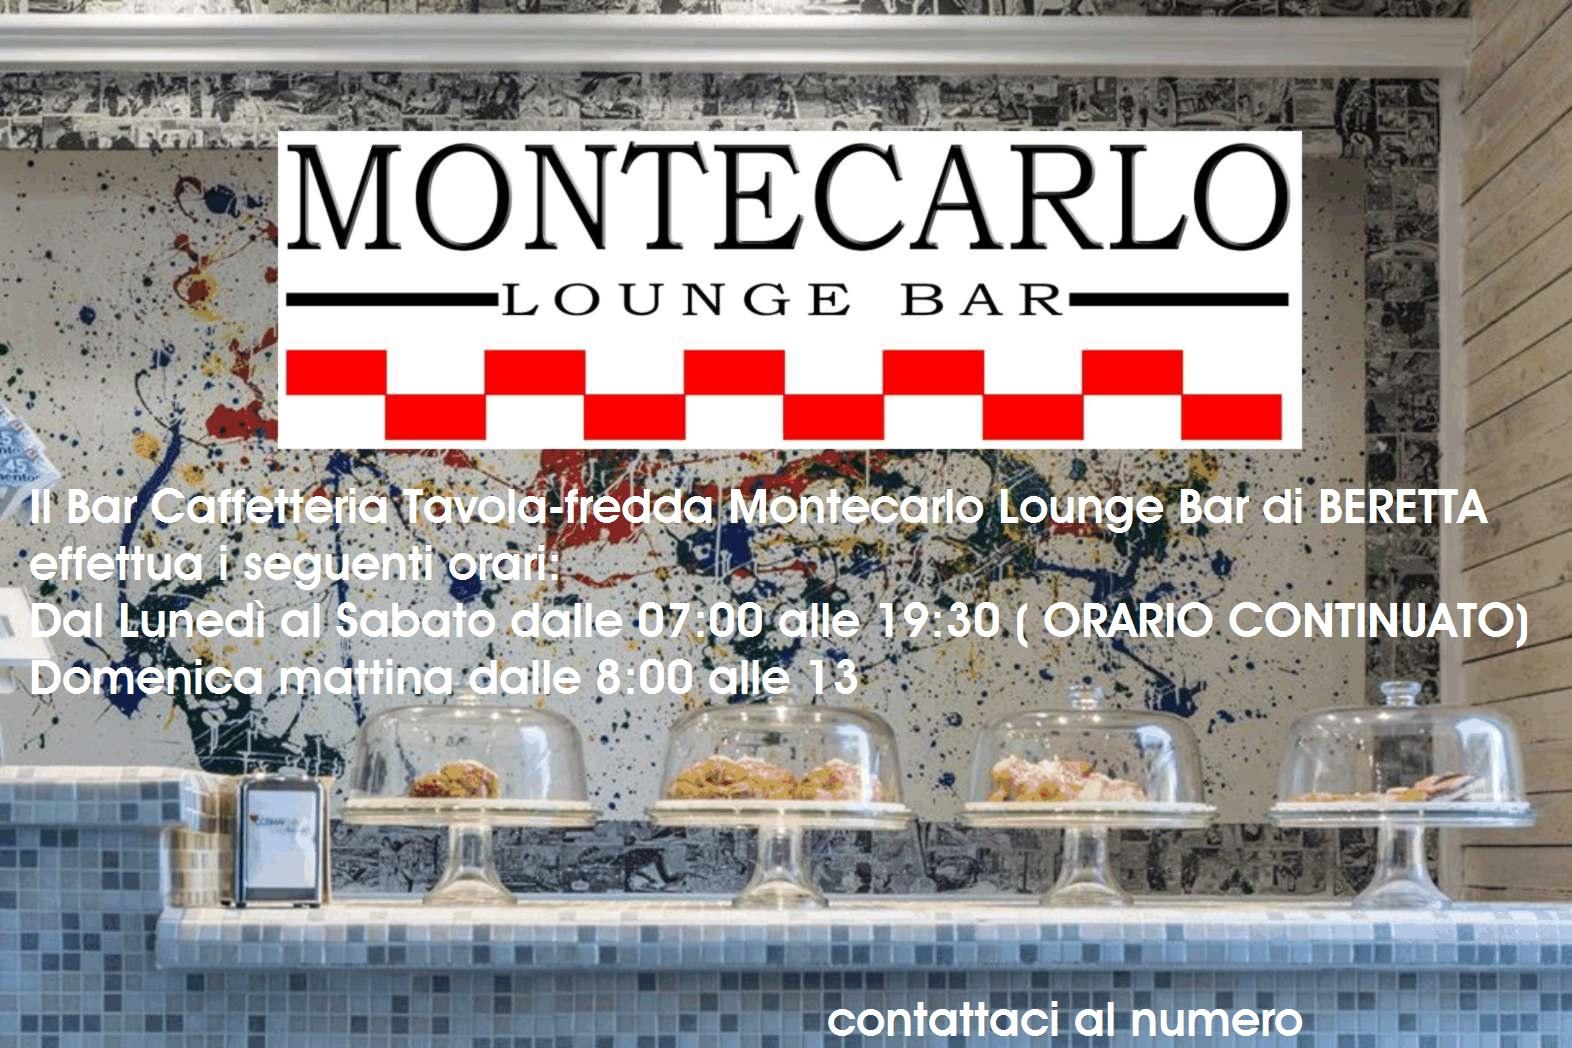 montecarloloungebar01